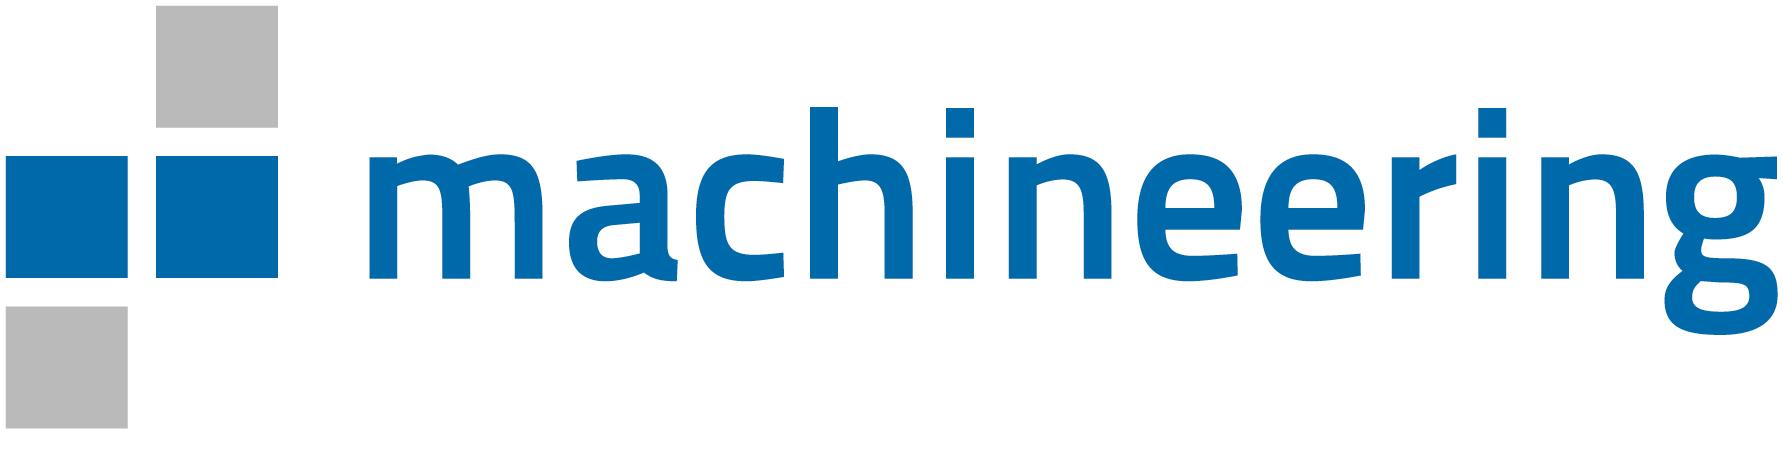 machineering GmbH & Co. KG